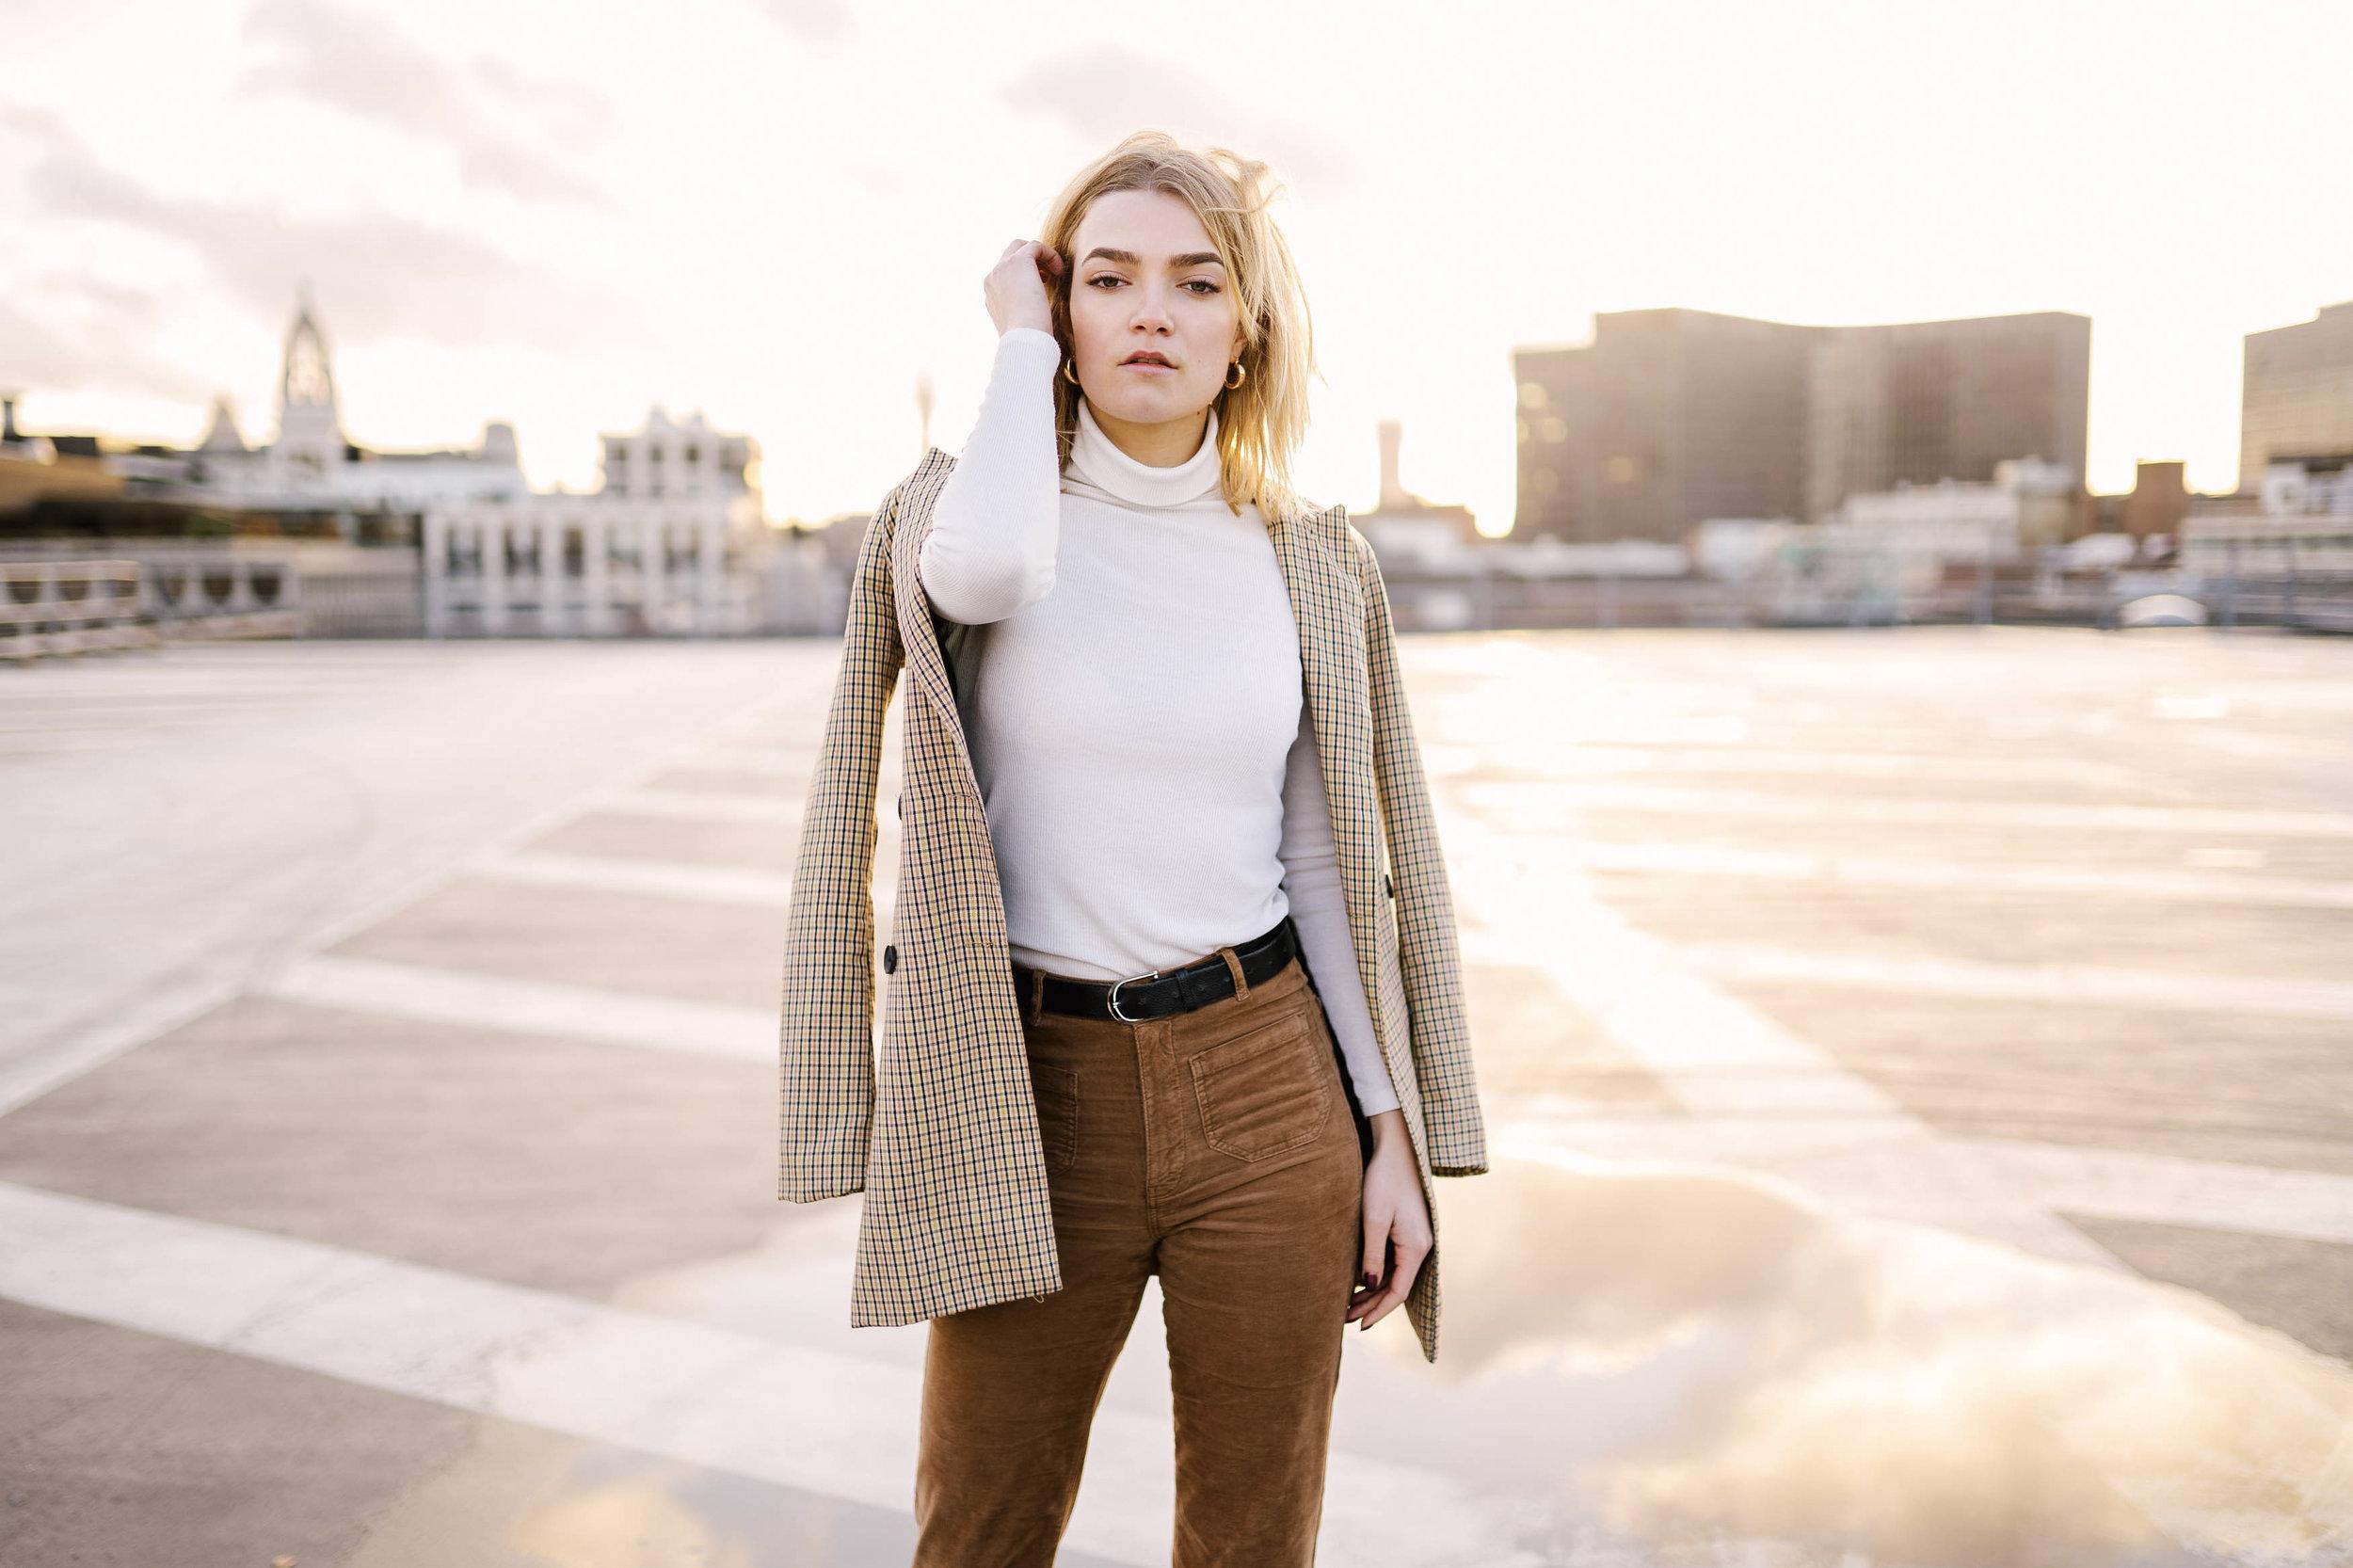 Roxane-portrait-photographe-leleu-bruxelles-filmaker-23.jpg